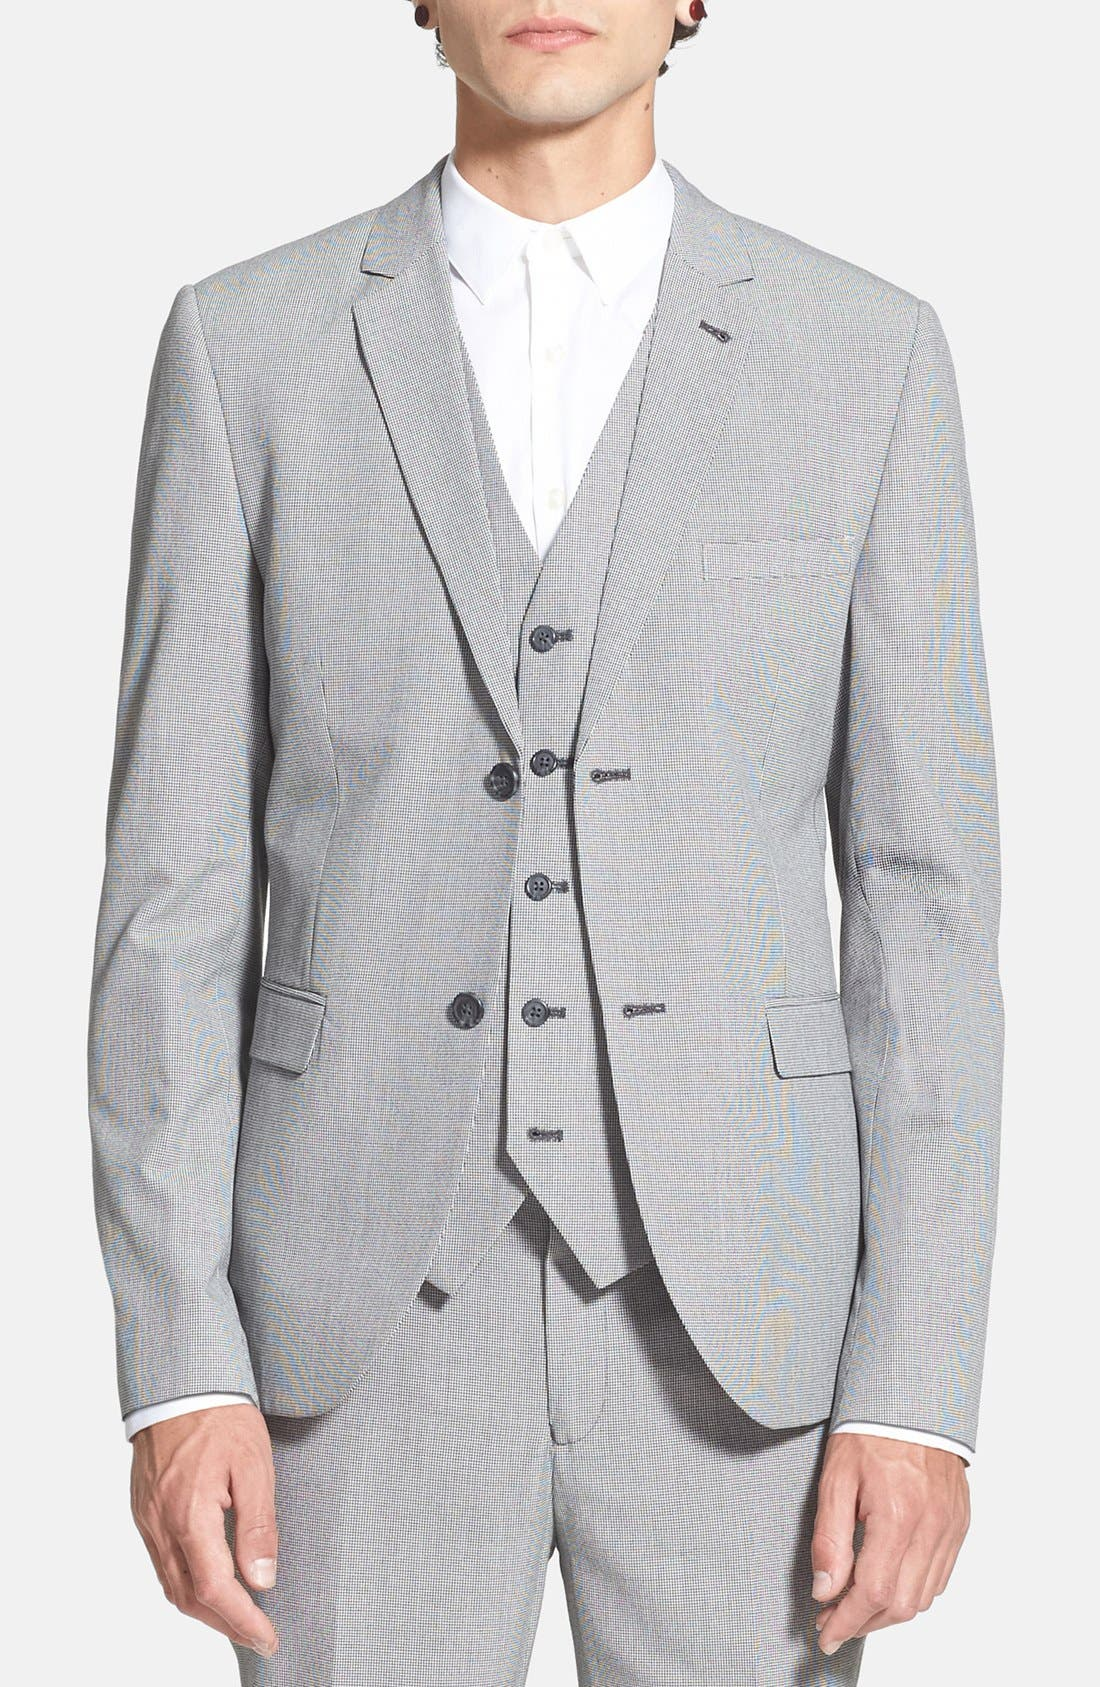 Alternate Image 1 Selected - Topman Skinny Fit Micro Houndstooth Suit Jacket